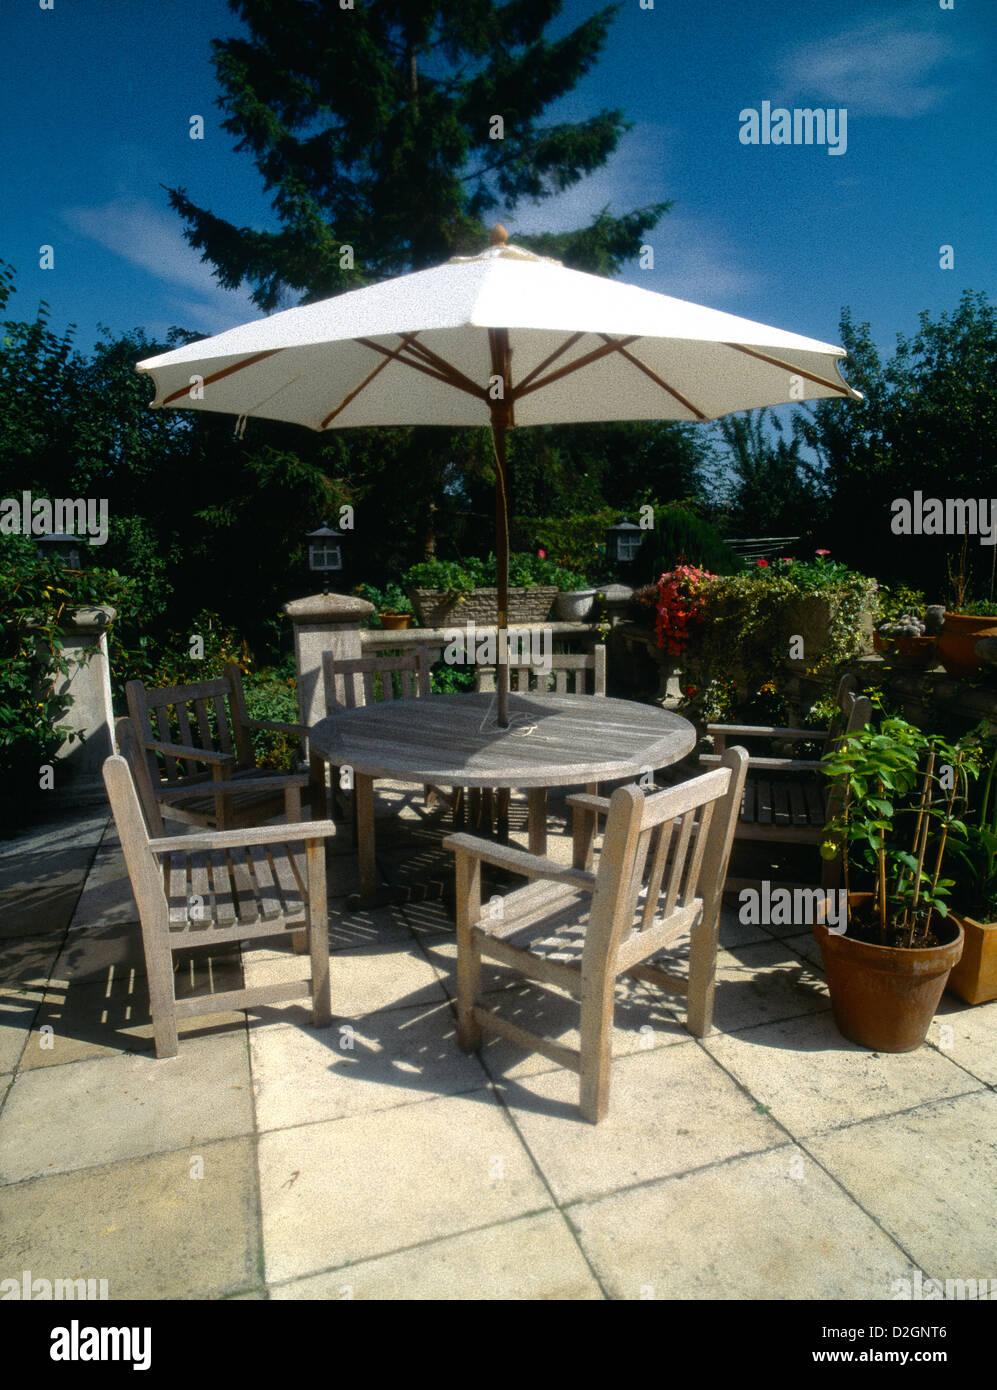 Wooden Garden Furniture Table U0026 Chairs U0026 Sun Shade Umbrella